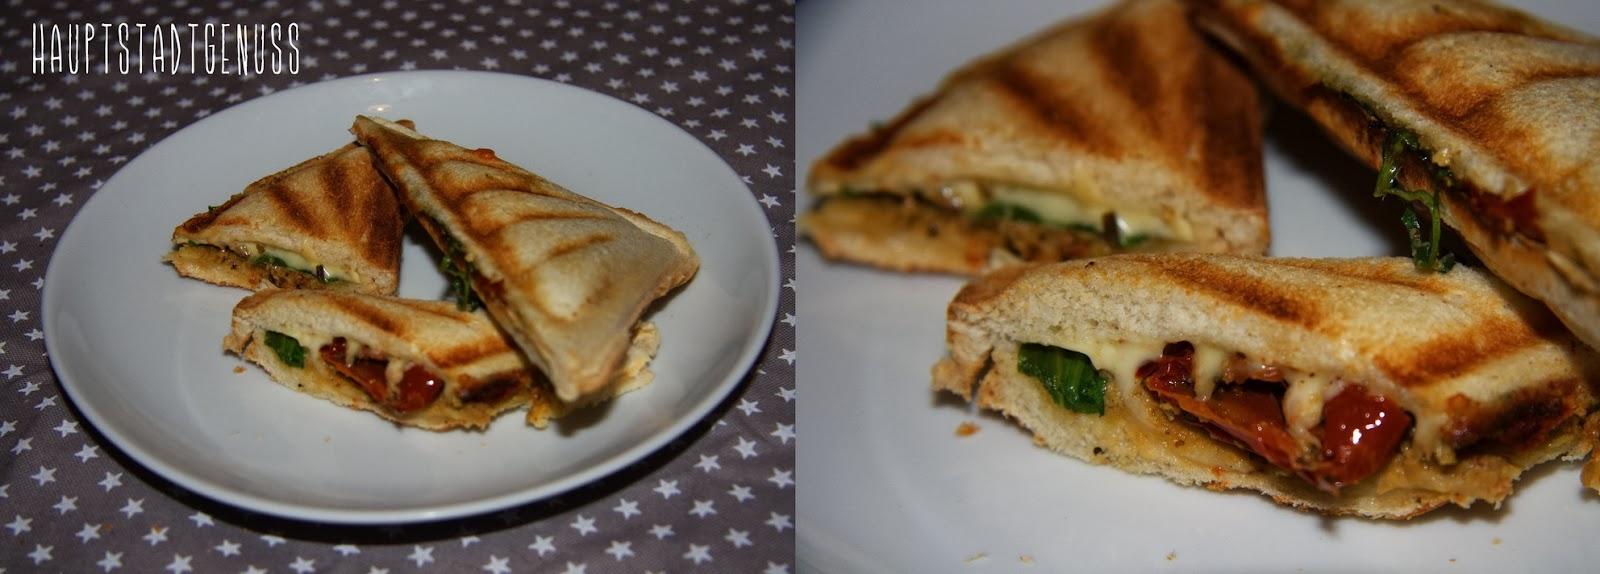 hauptstadtgenuss golden toast american sandwich im test sandwich ideen. Black Bedroom Furniture Sets. Home Design Ideas